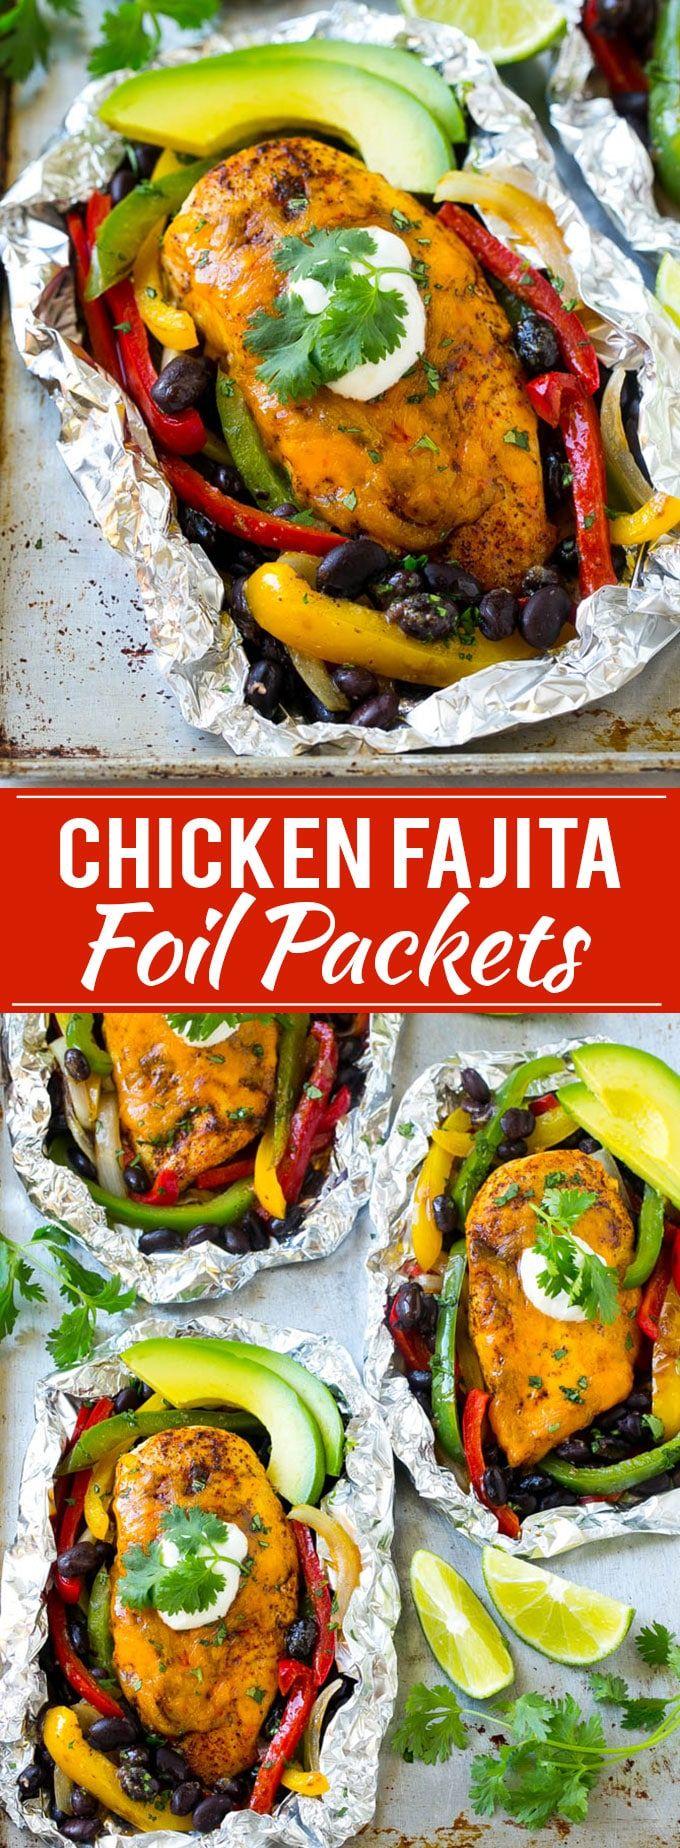 Chicken Fajita Foil Packet Recipe   Chicken Fajita Recipe   Foil Pack Recipe   Mexican Chicken